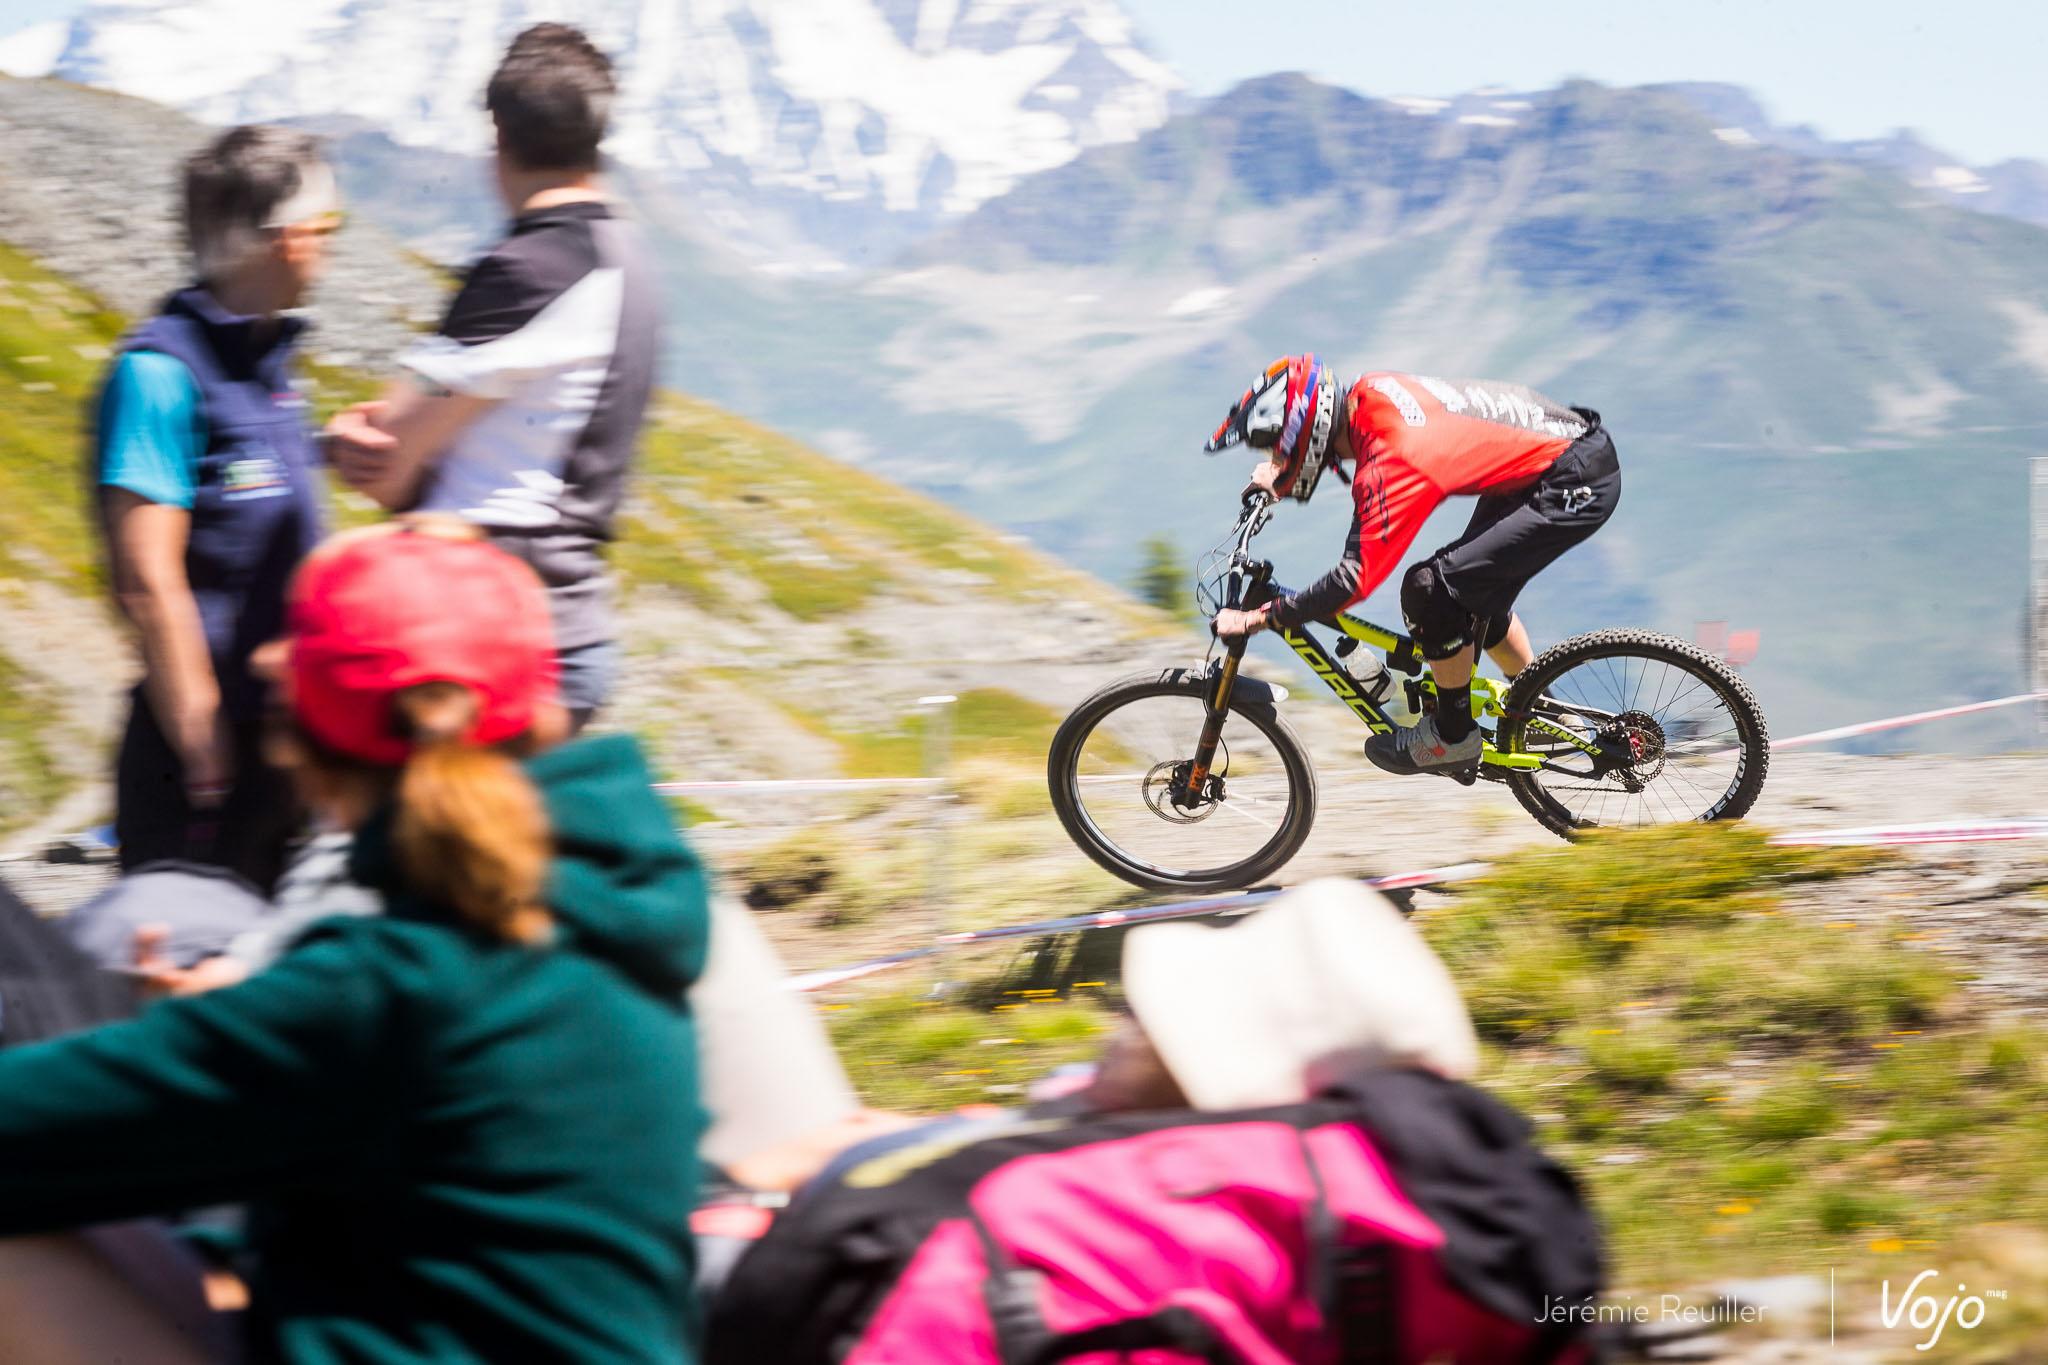 EWS_La_Thuile_raceday_1_Copyright_Reuiller_VojoMag-2-2